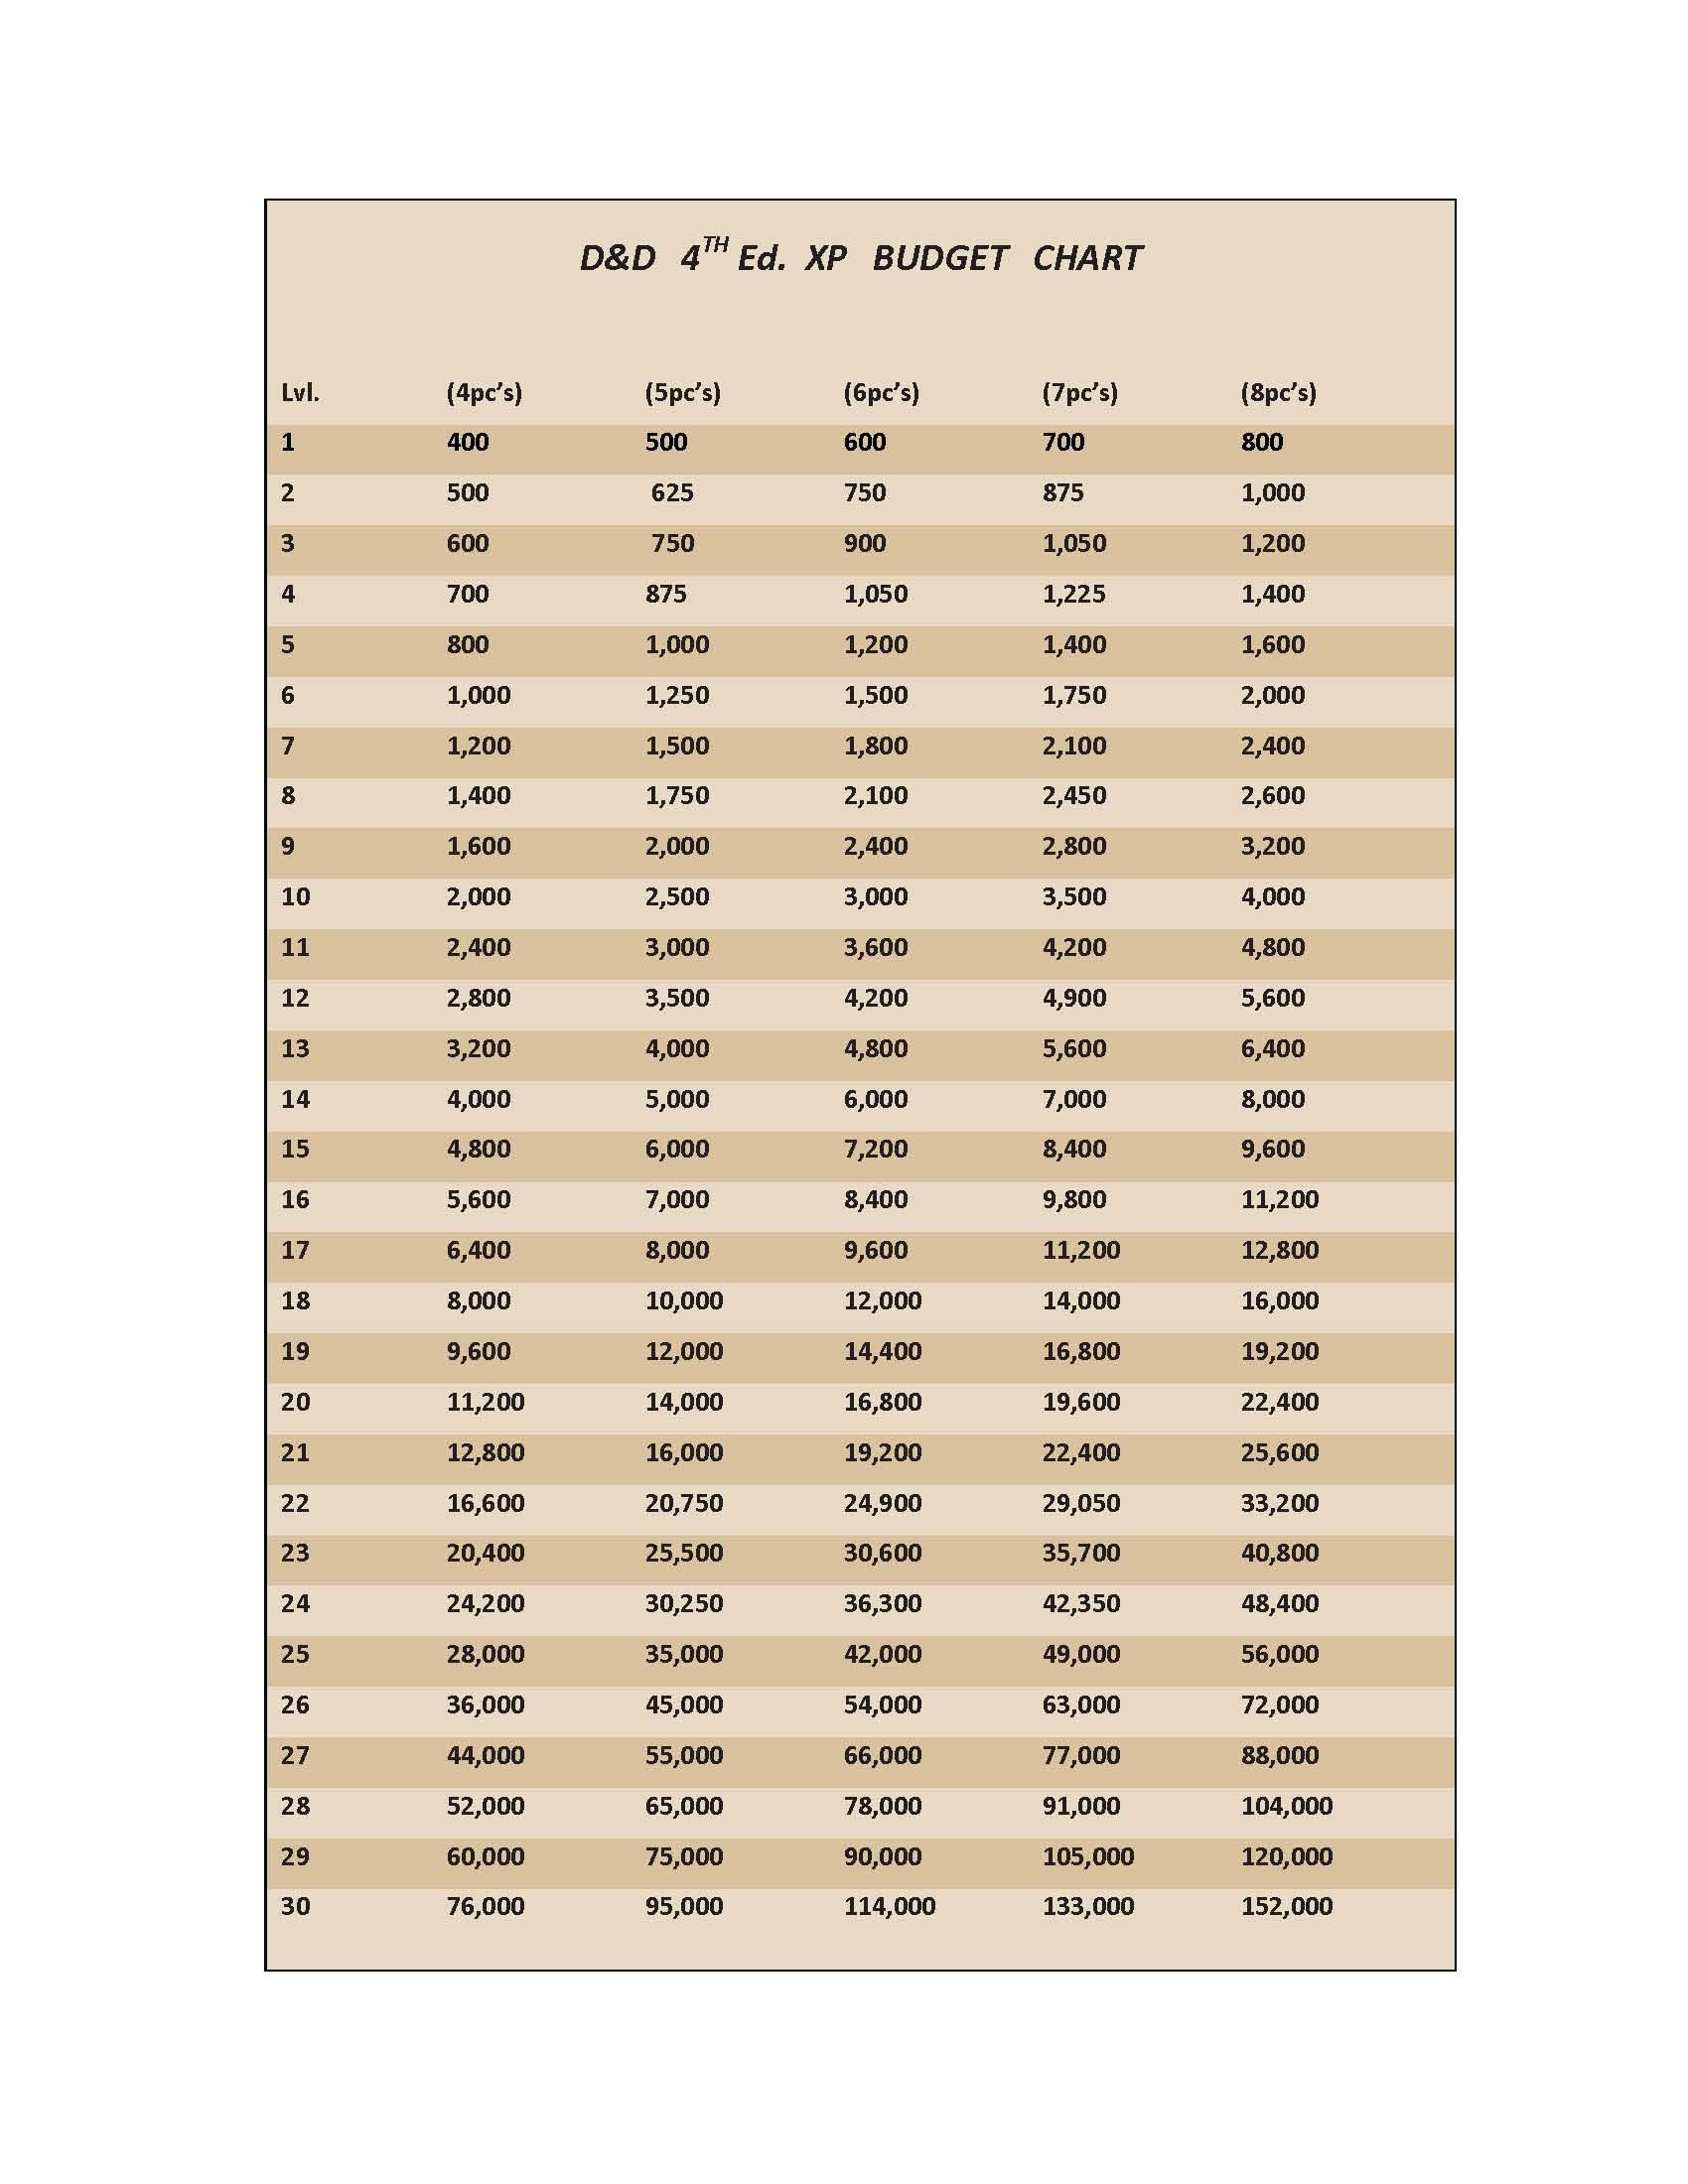 XP Budget Chart